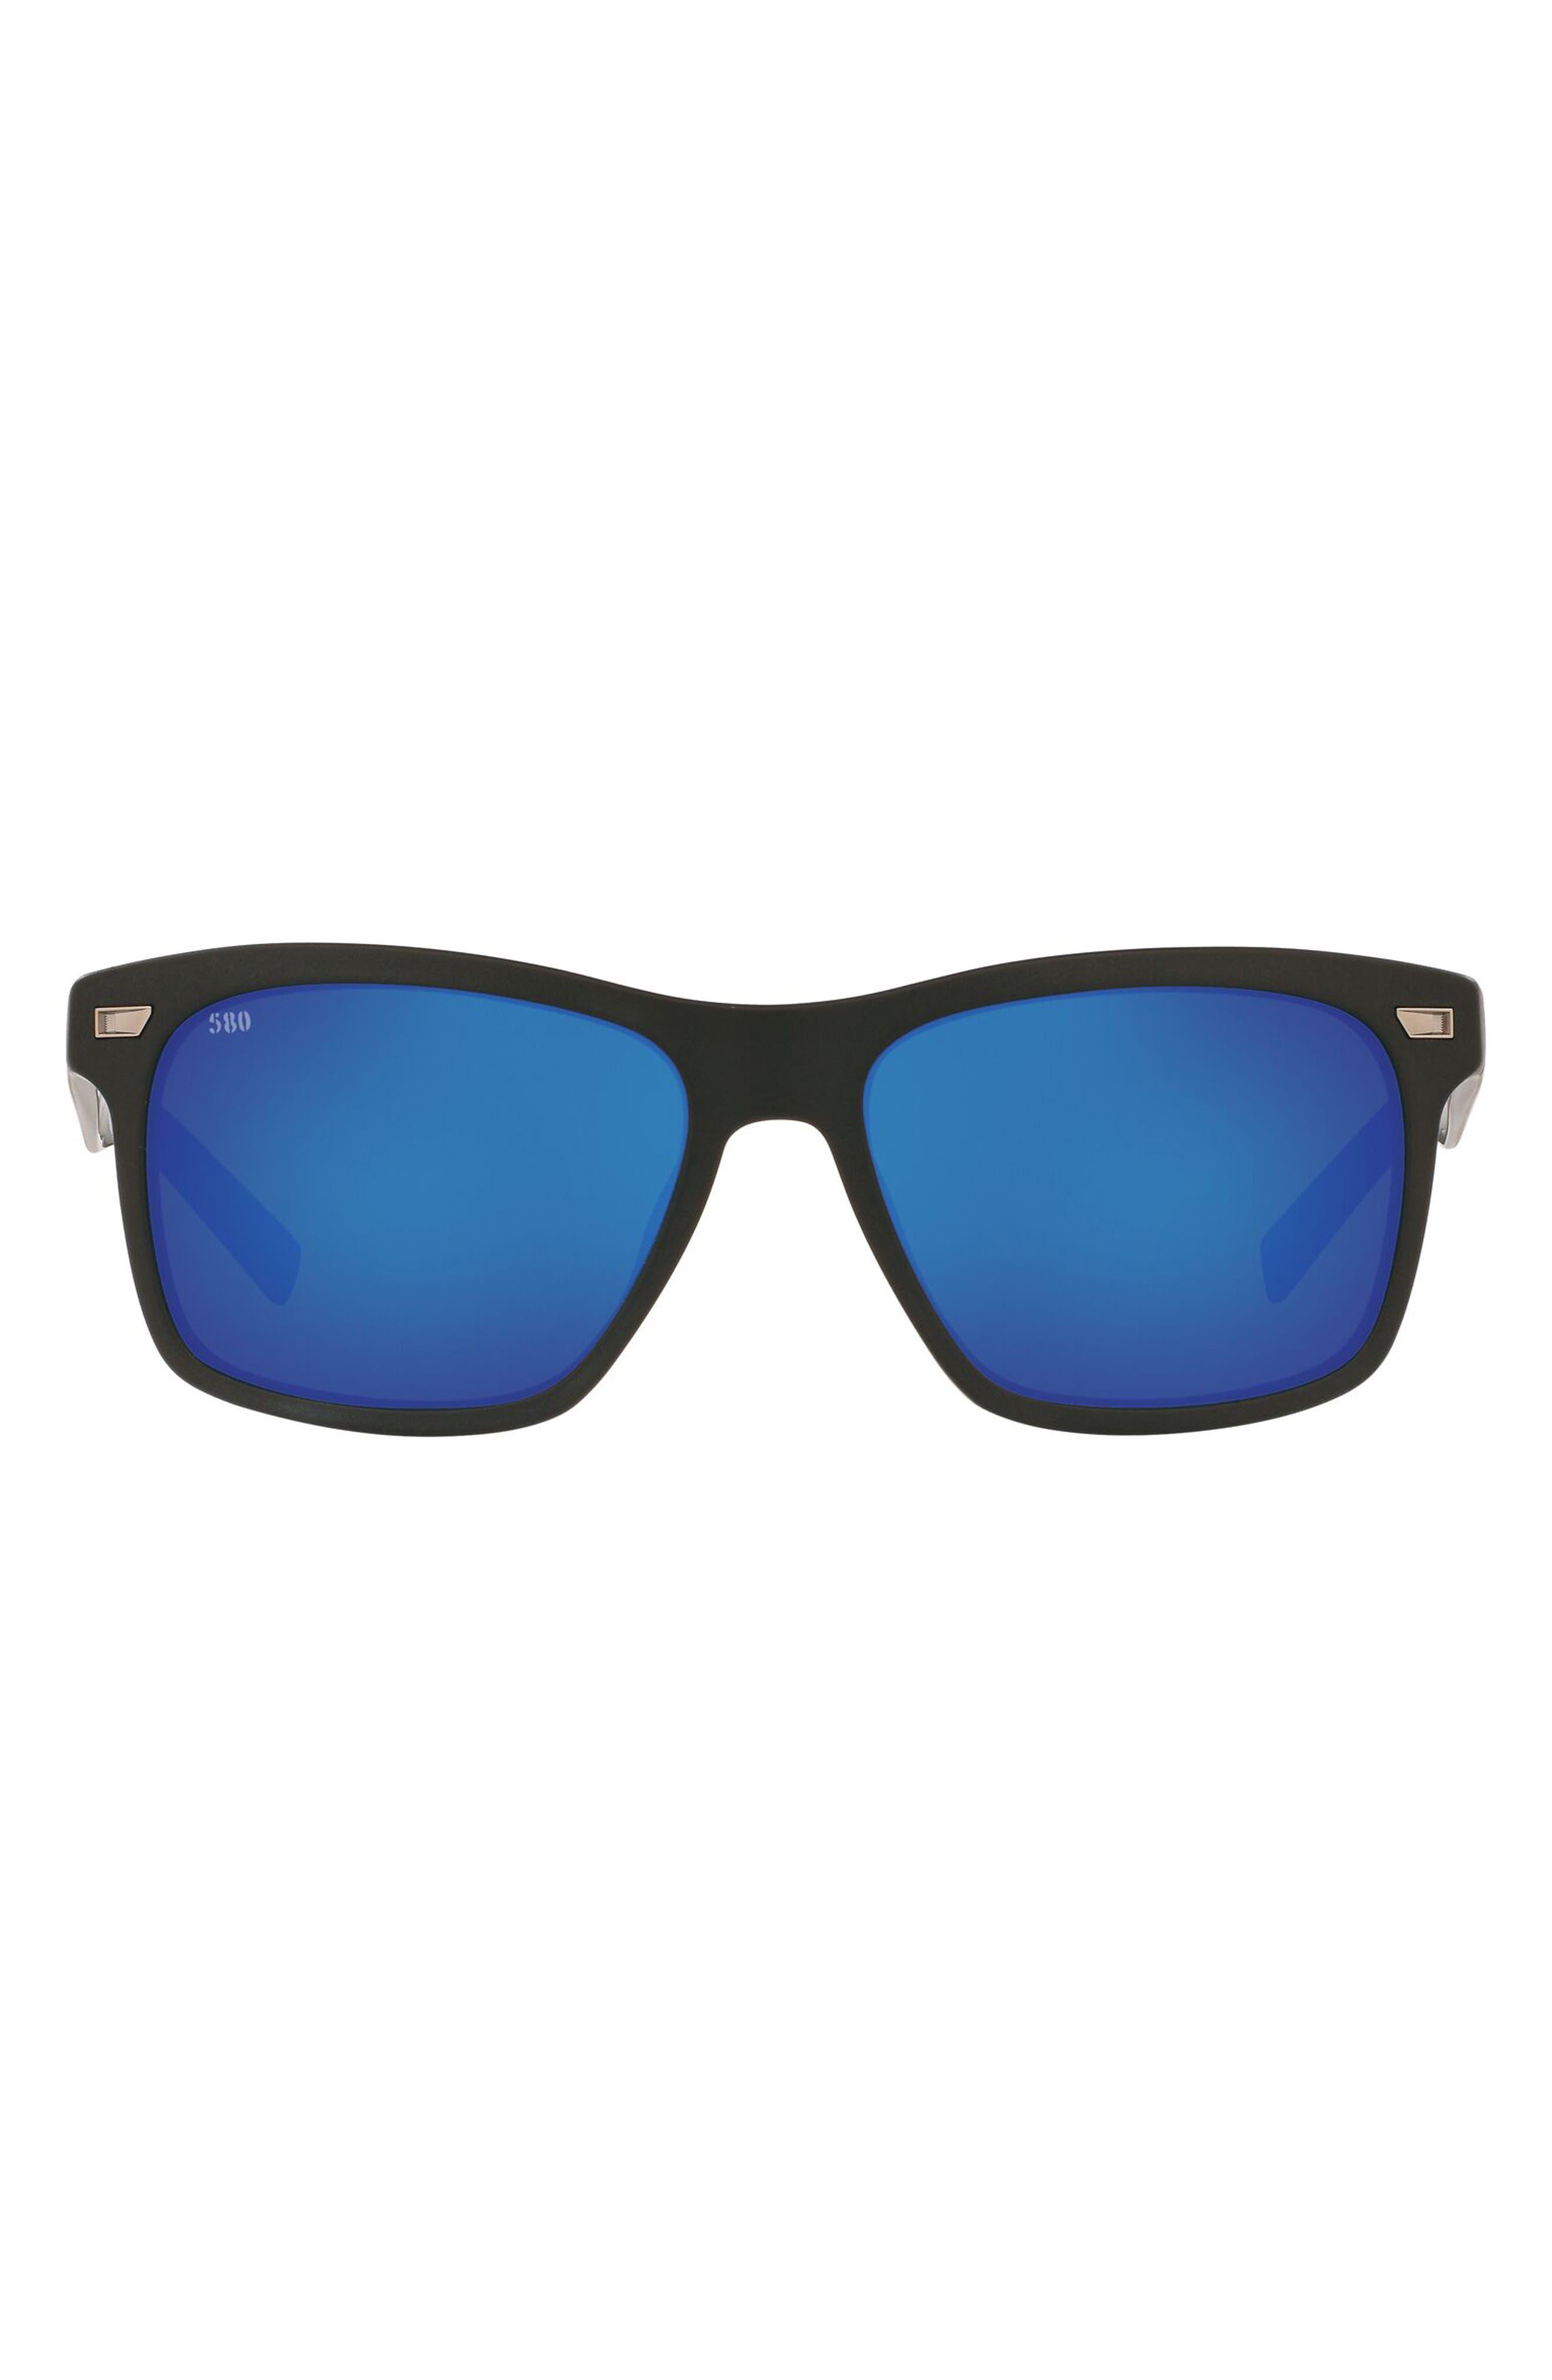 Phantos 58mm Polarized Sunglasses